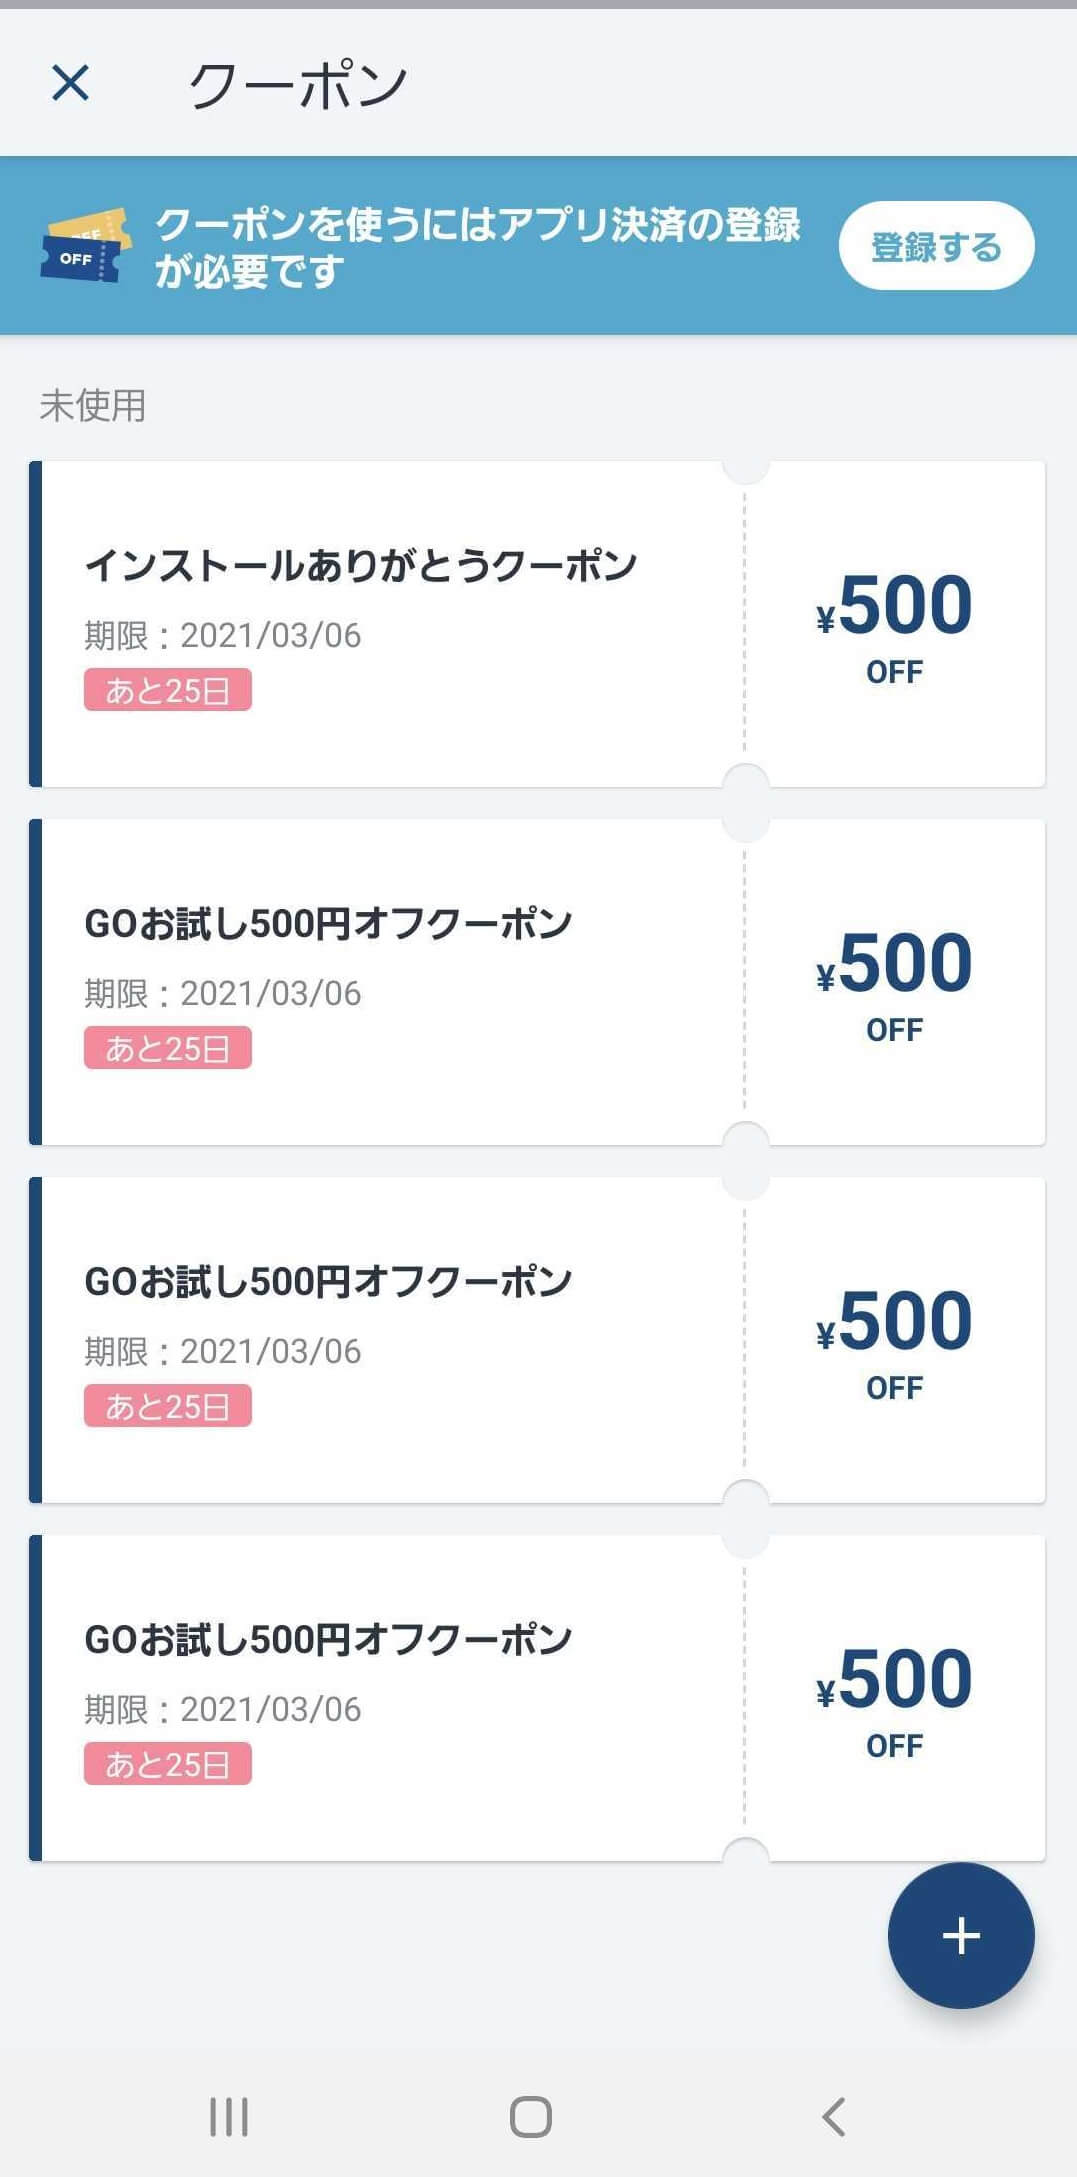 GOタクシー総額2500円クーポン&特典の取得方法